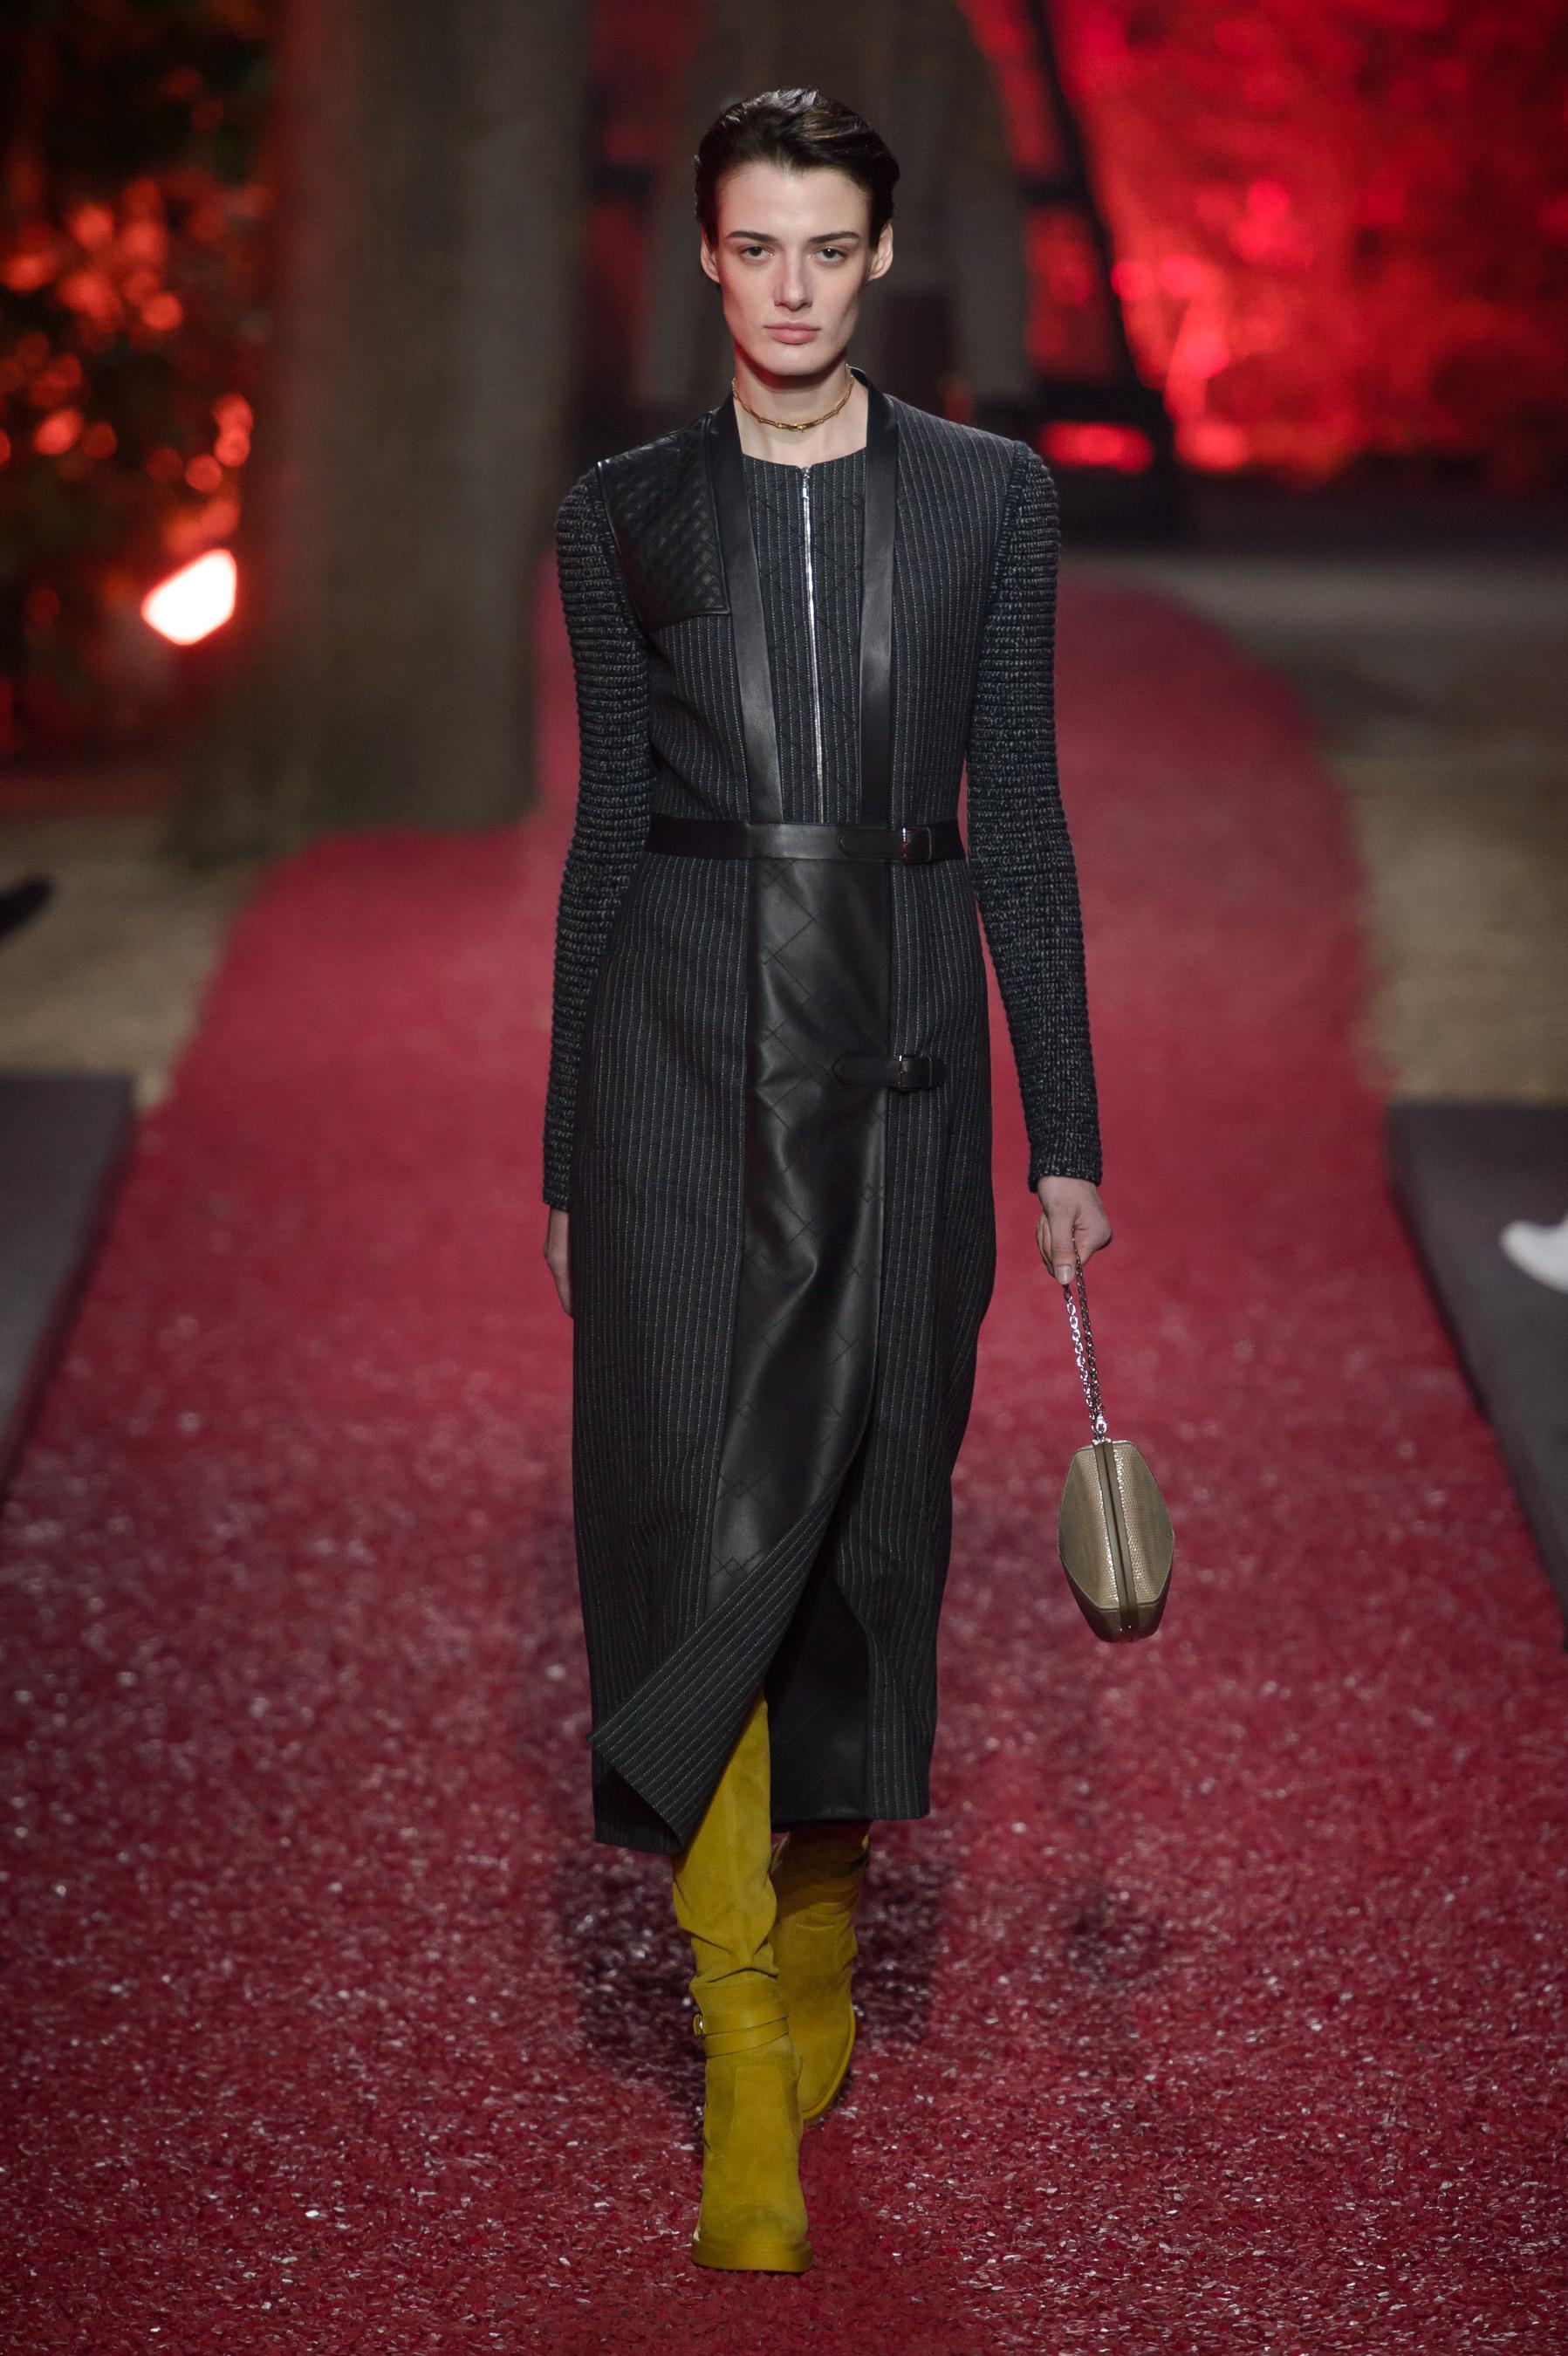 70cb7be2ae64 Défilé Hermès automne-hiver 2018-2019 Prêt-à-porter - Madame Figaro